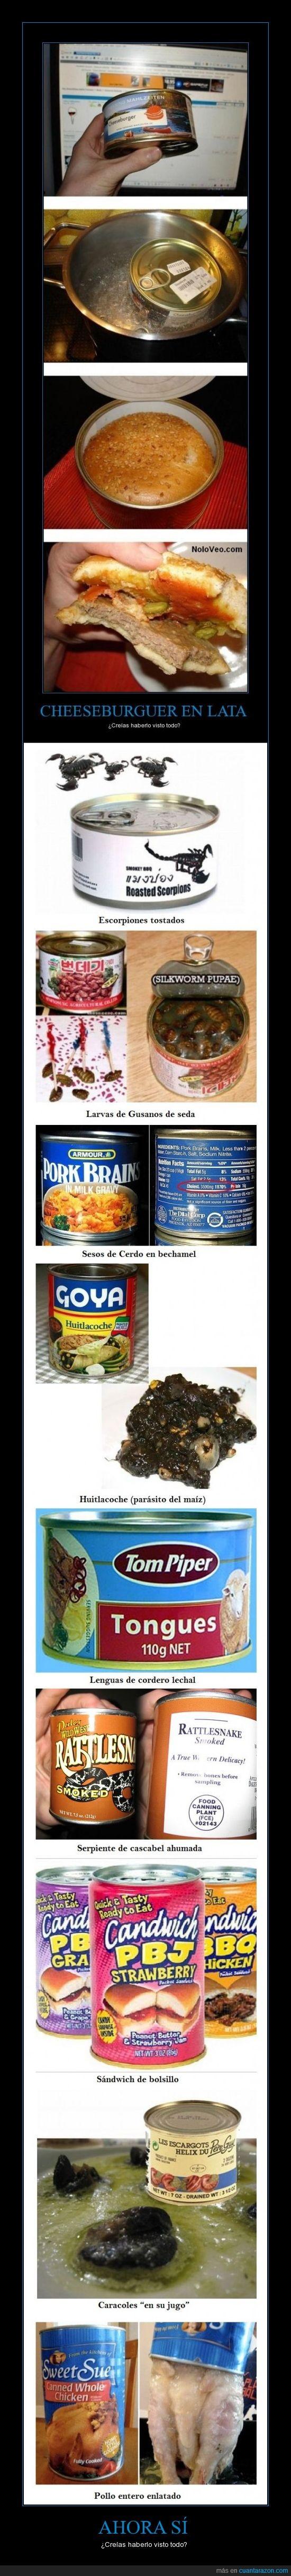 comida,enlatada,hamburguesa,pollo,rara,serpiente